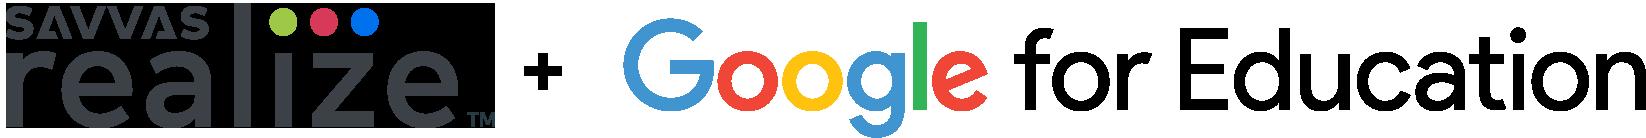 Savvas Realize - logo